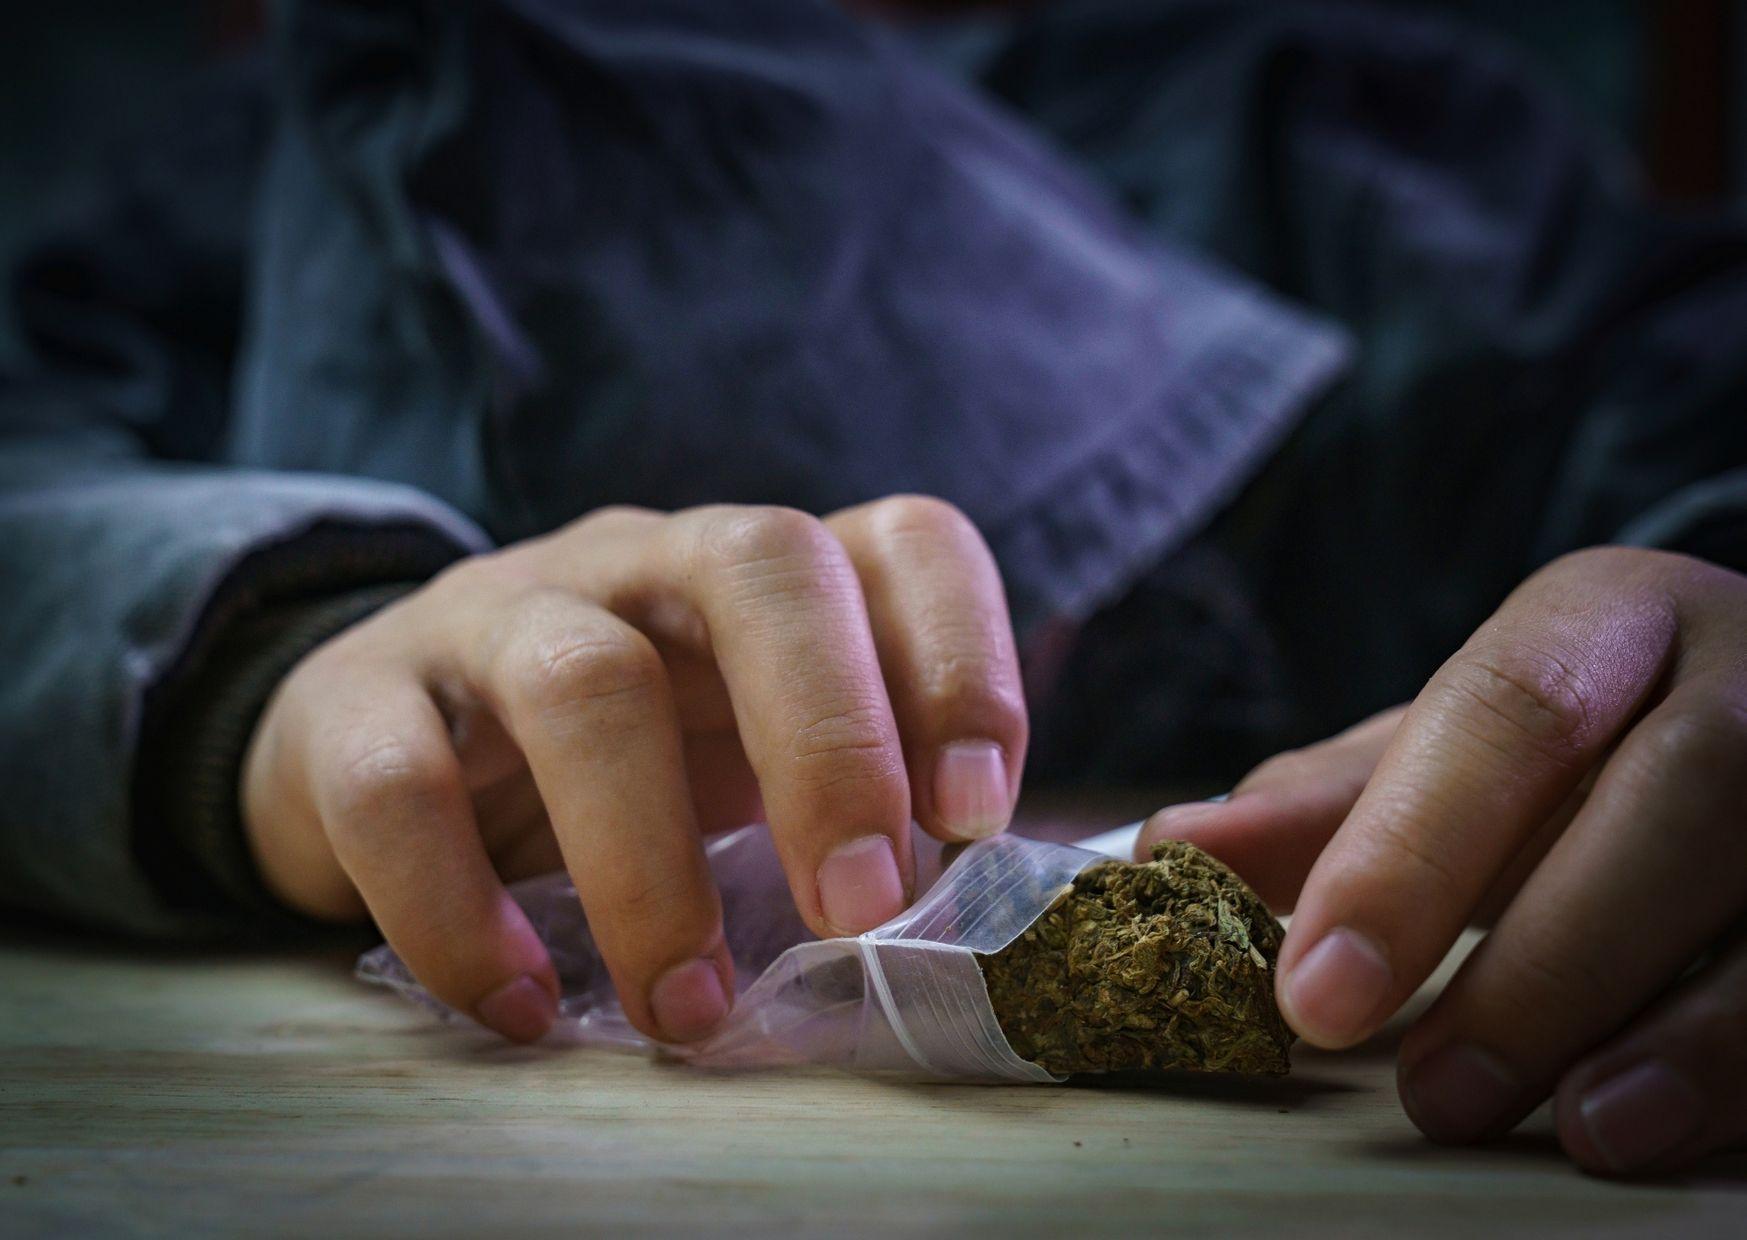 proč lidé berou drogy